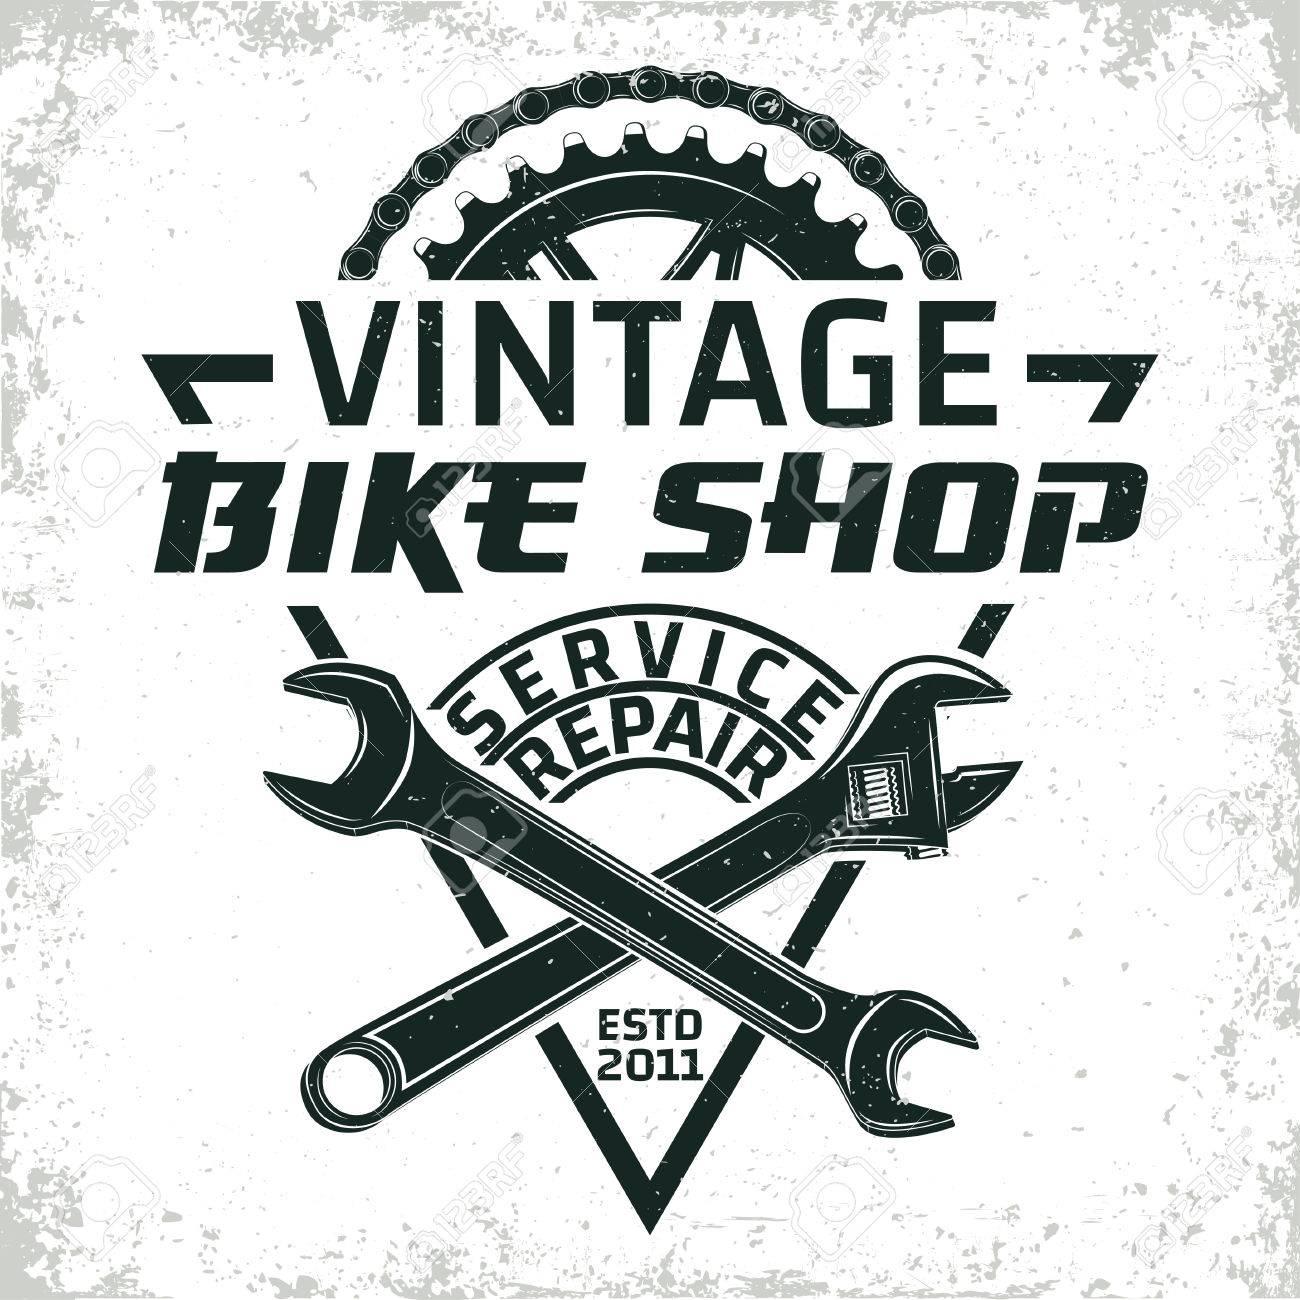 Vintage bicycles repair shop logo design, grange print stamp, creative typography emblem, Vector. - 80103302